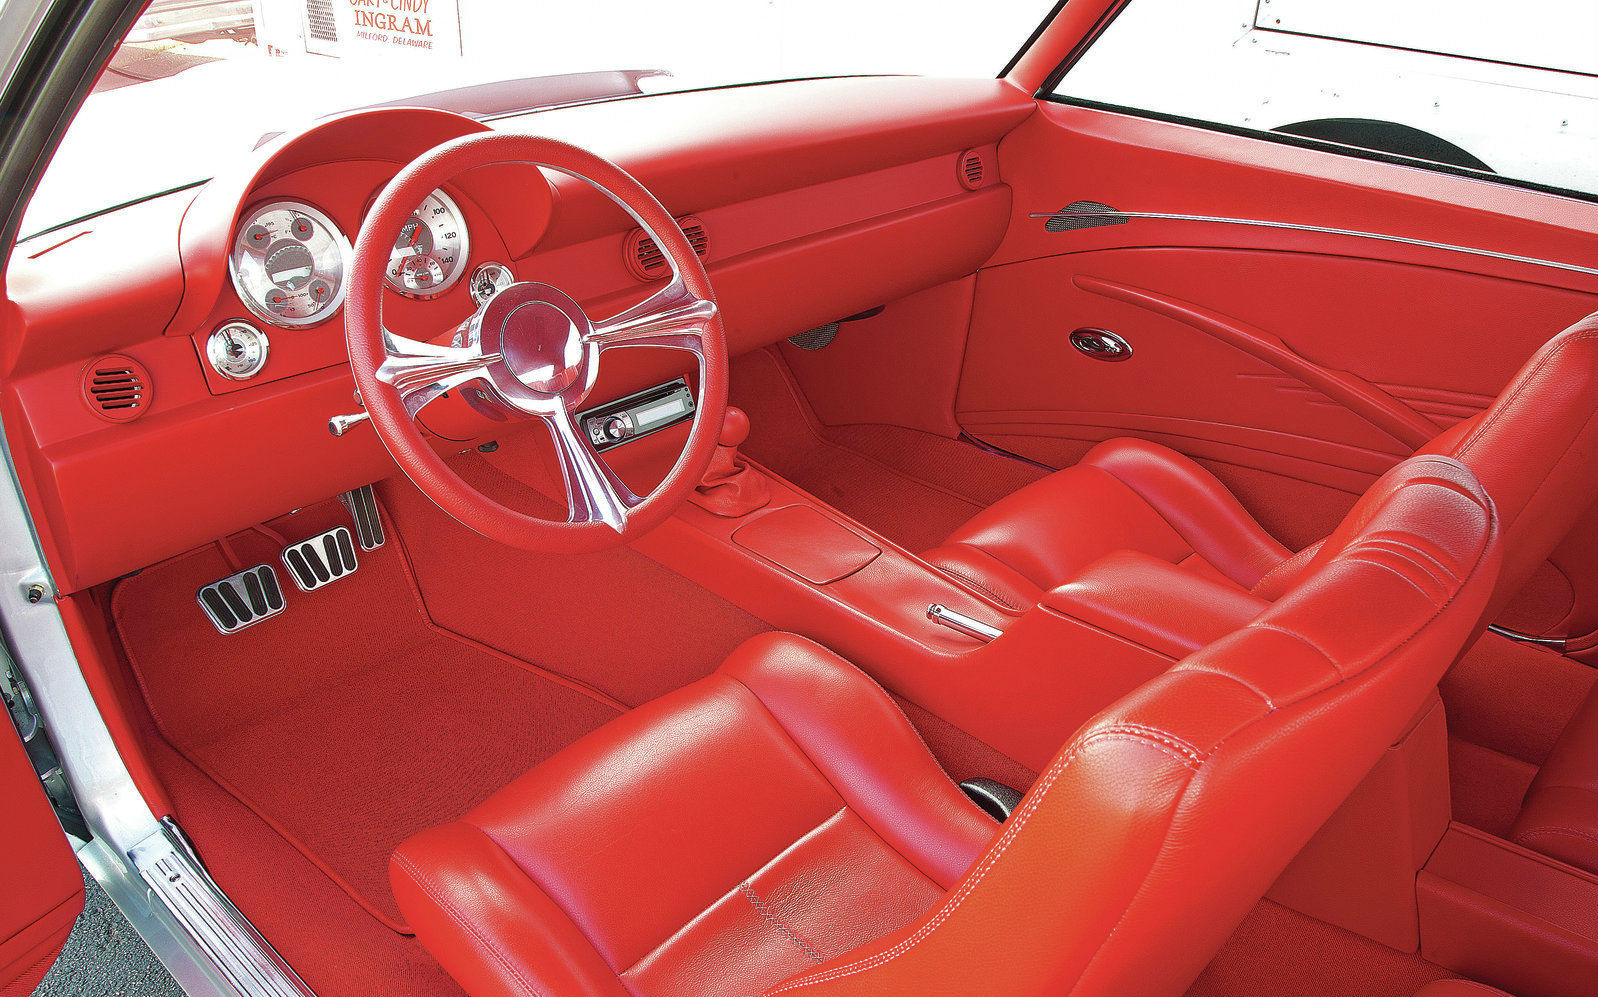 Chevy Camaro Red Interior View